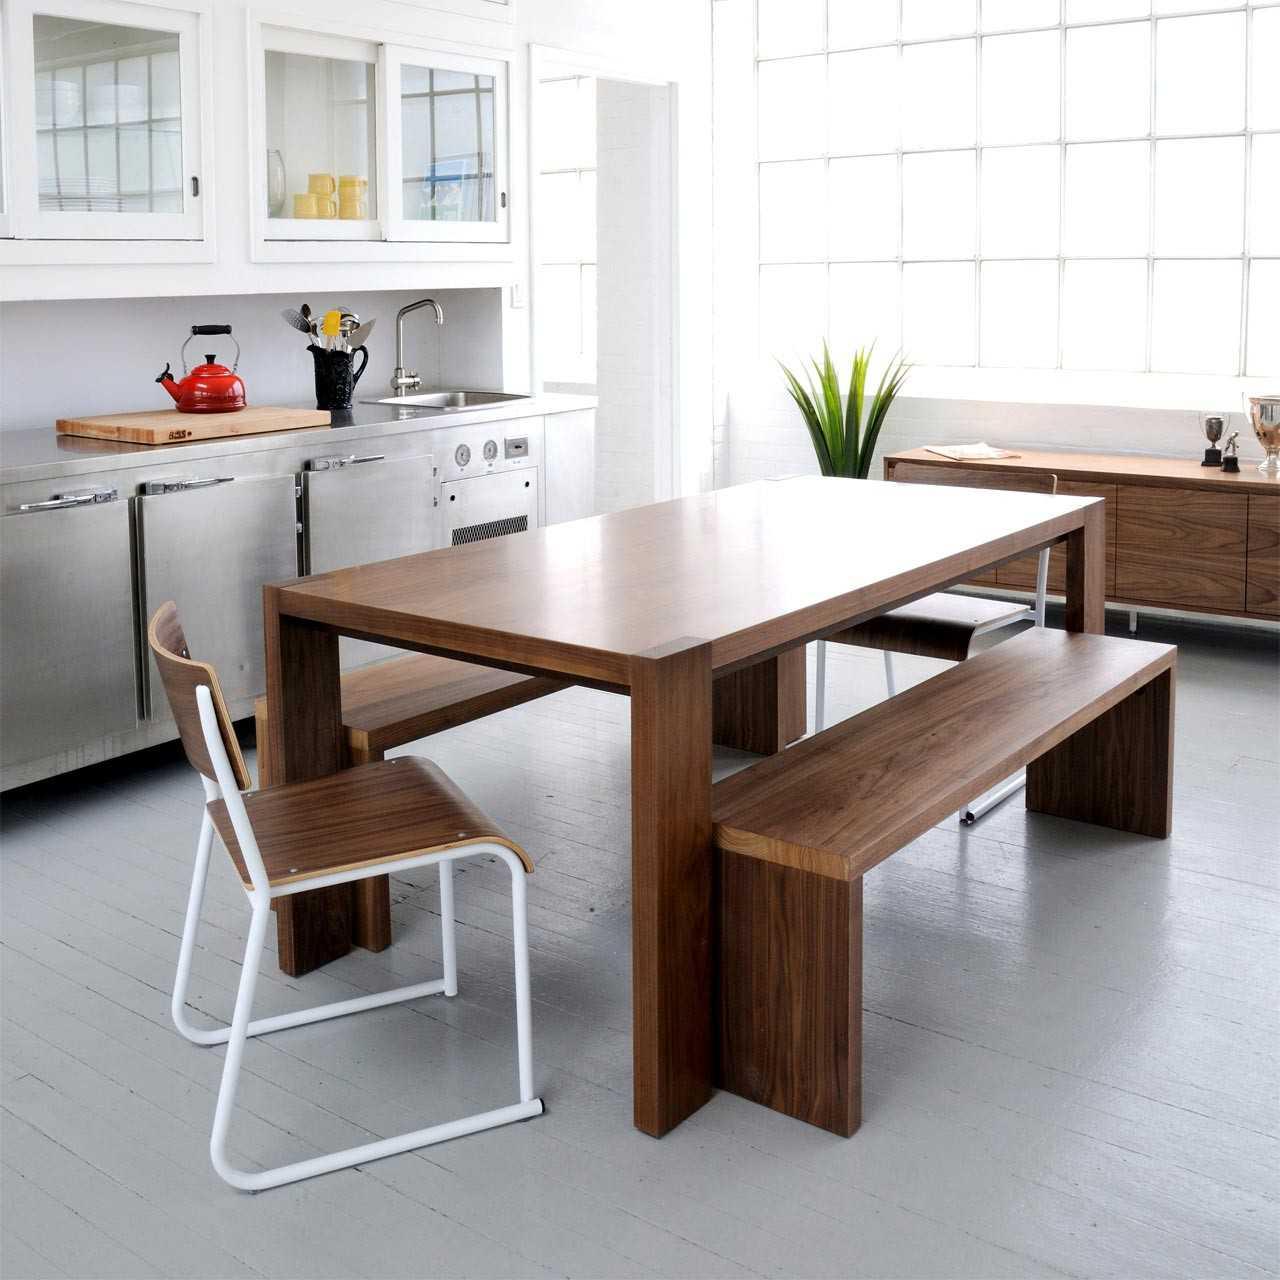 Meja Makan Minimalis Ruangan Kecil Decopoint Jogja